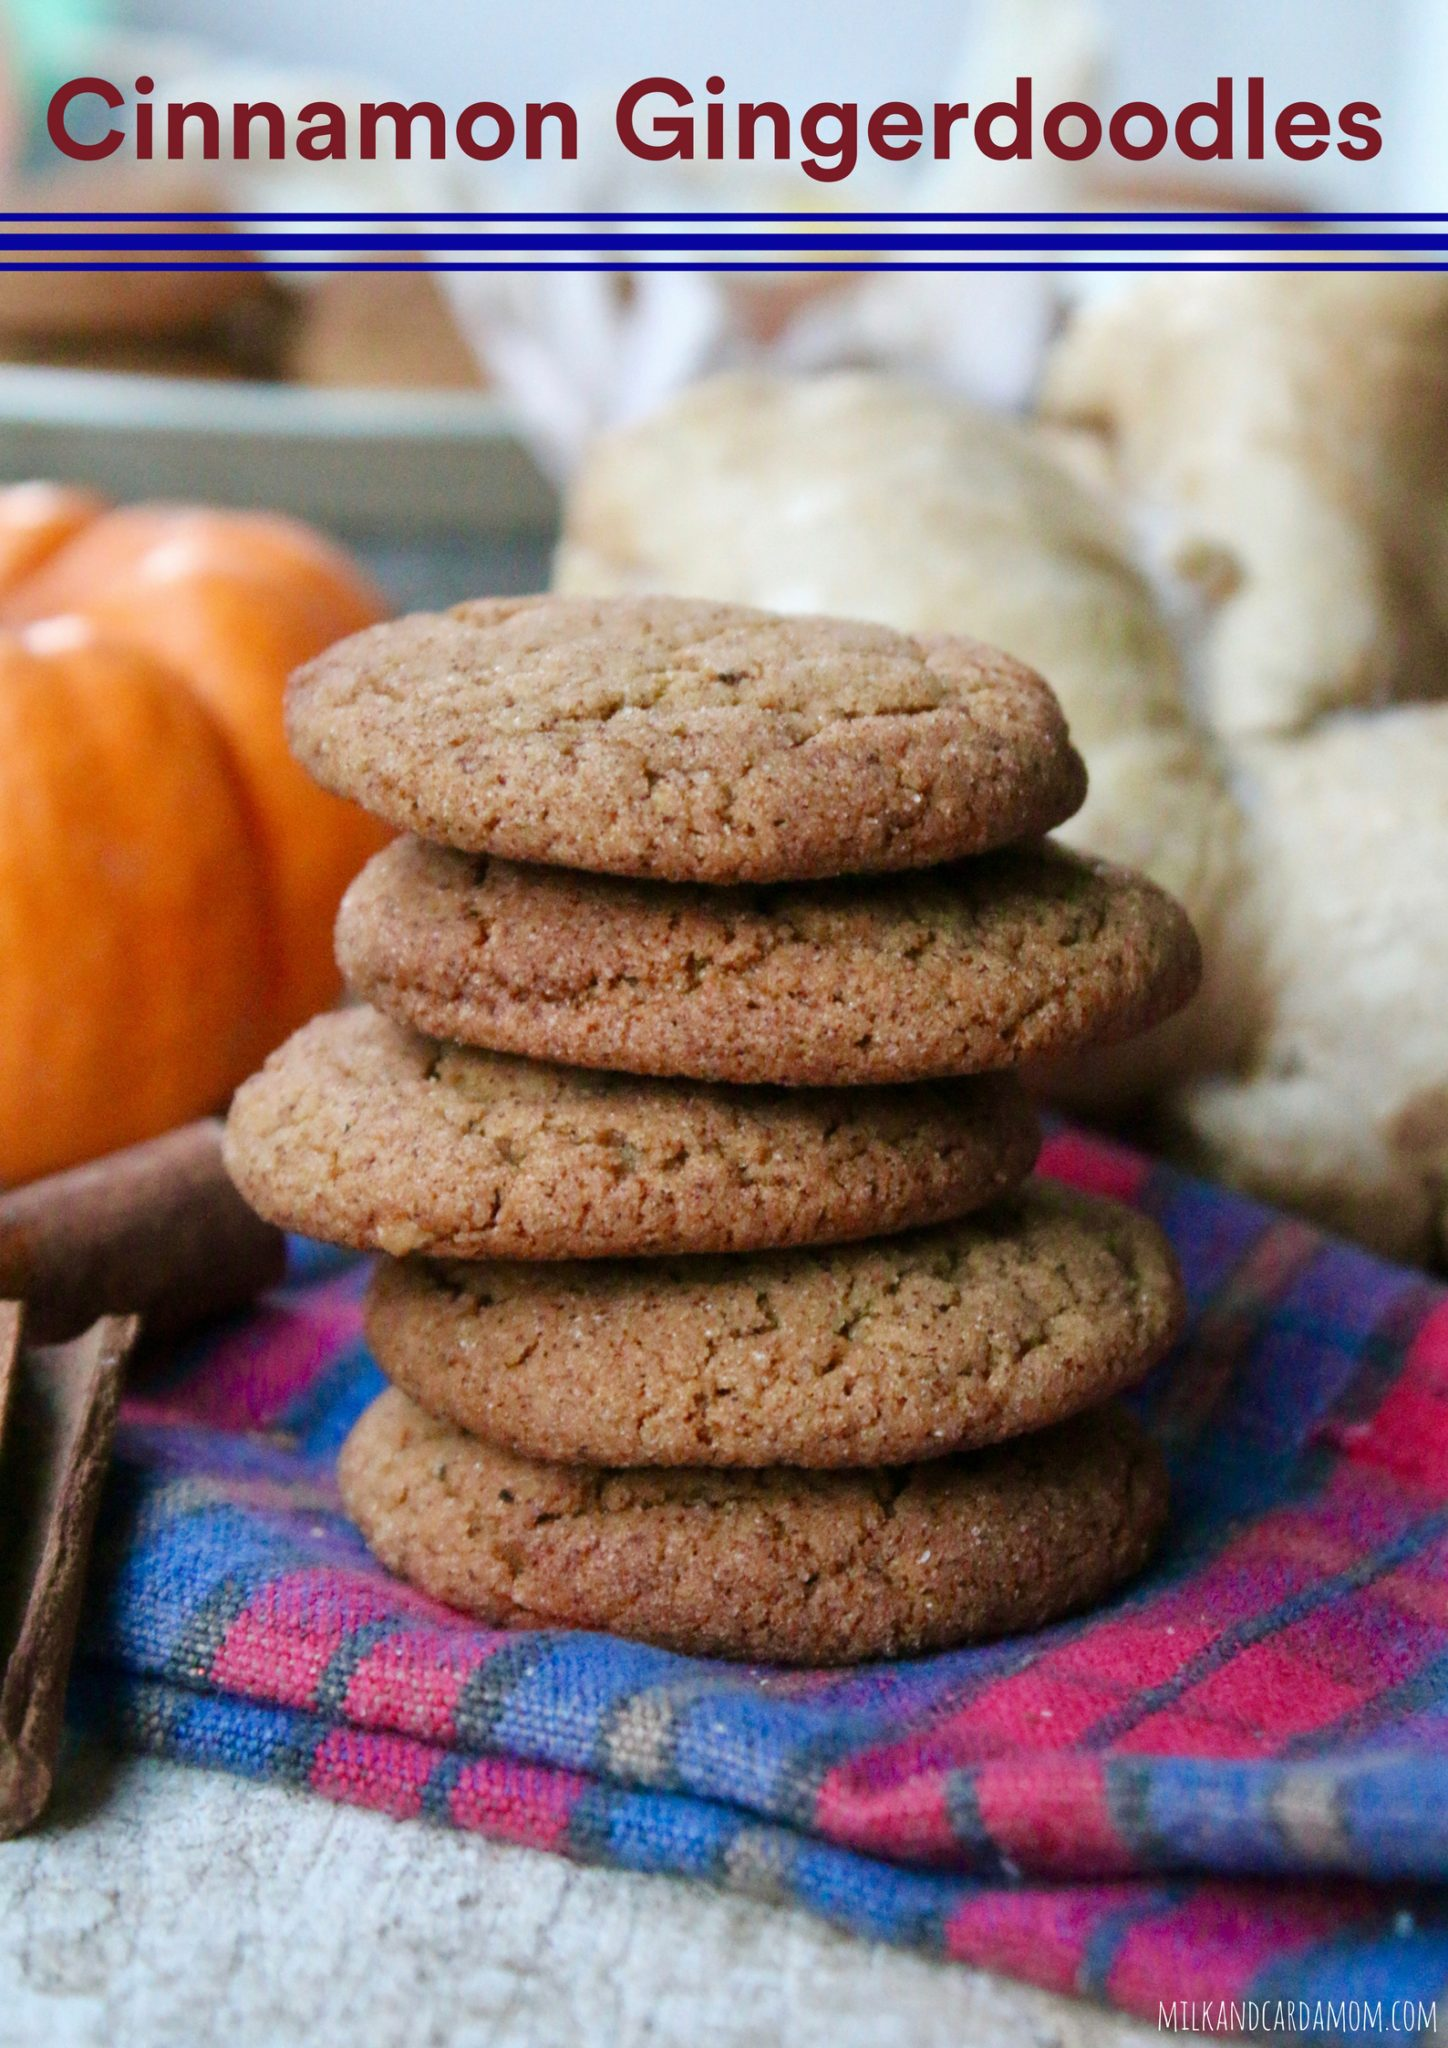 Cinnamon Gingerdoodles